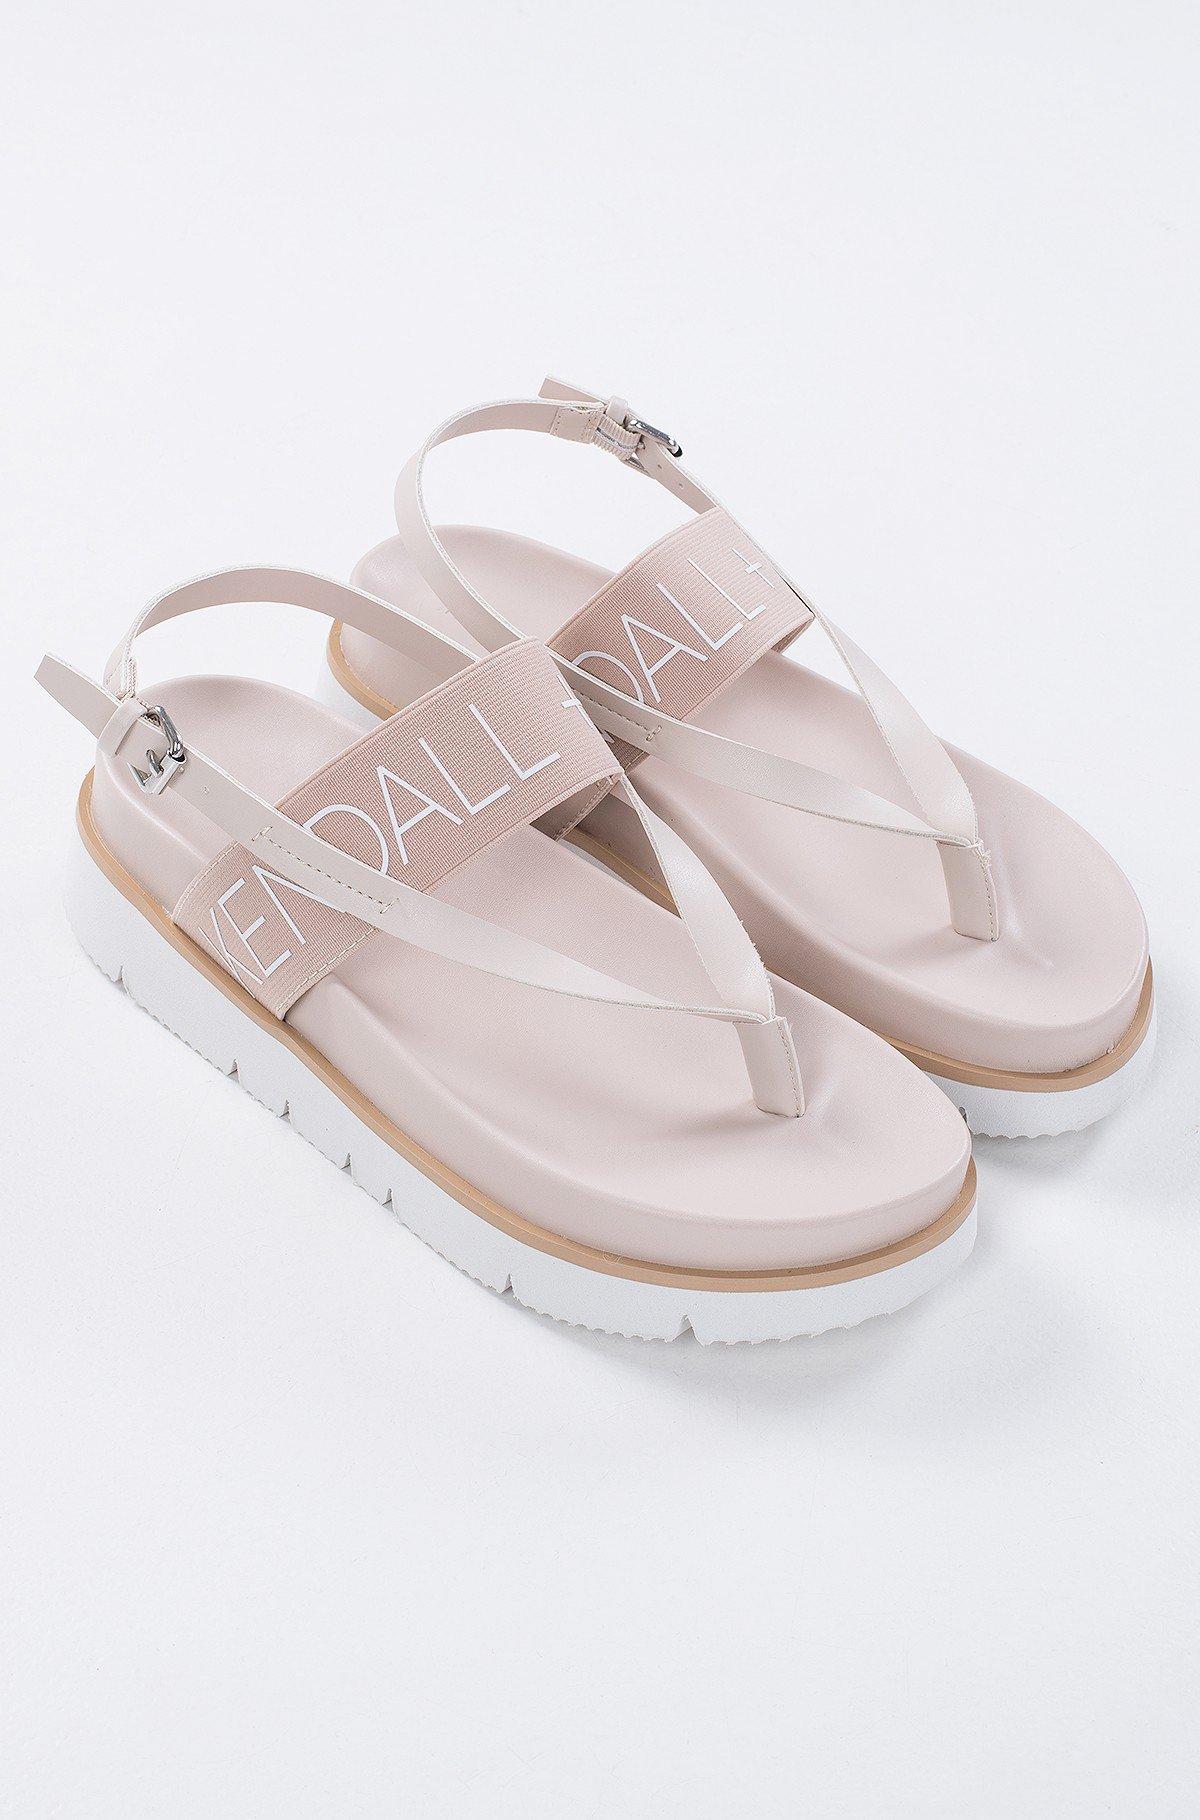 Sandals LIAN-full-1